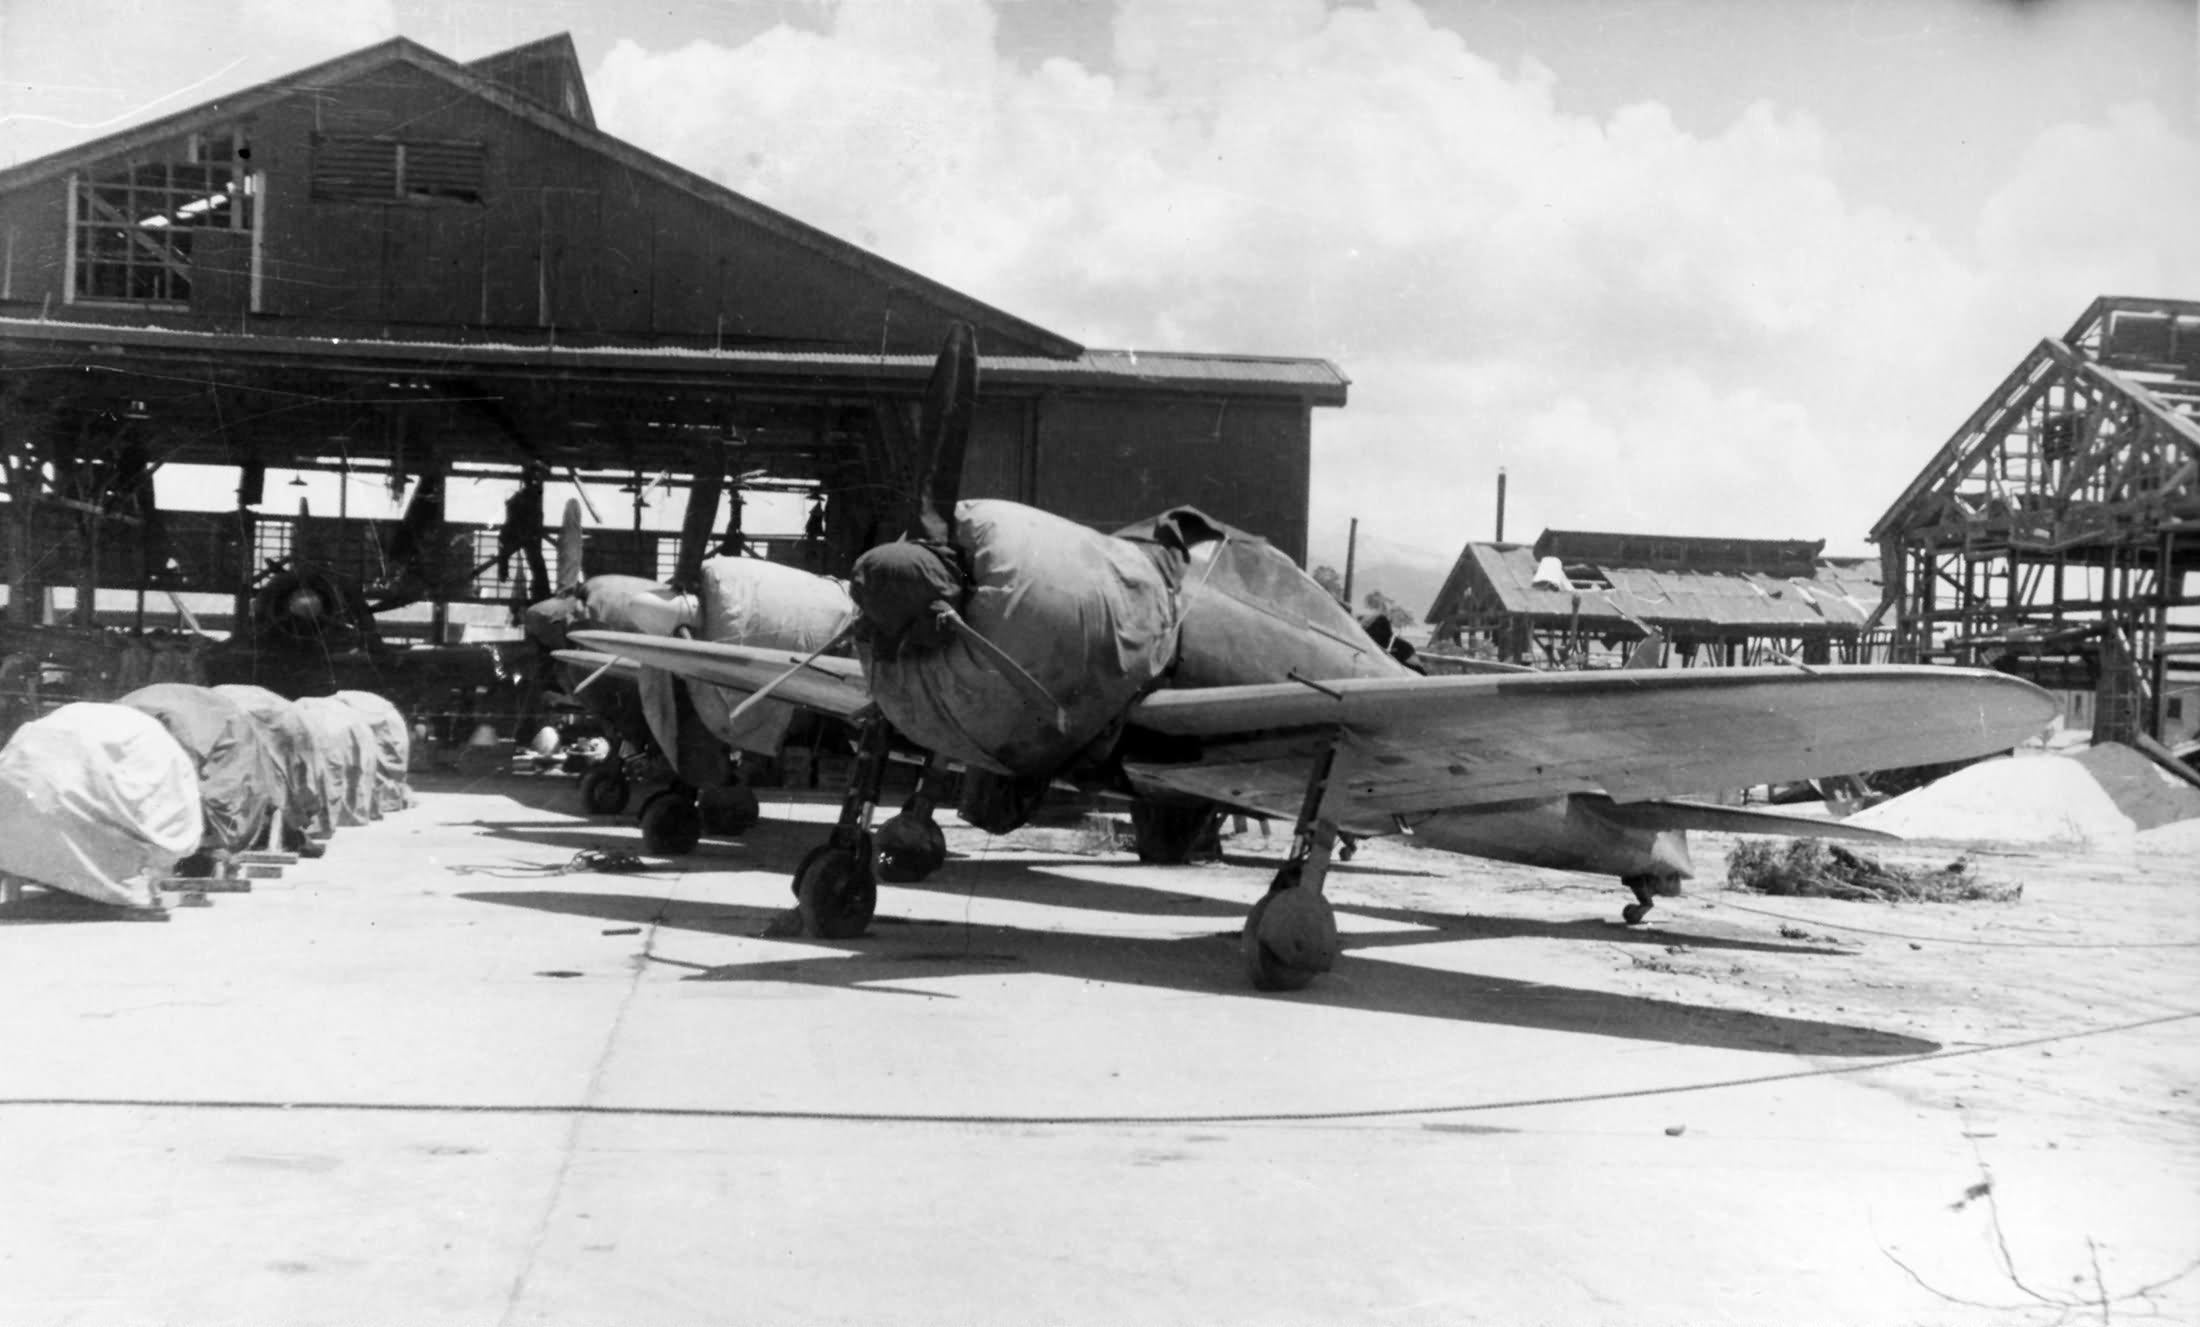 A6m5 Zero Fighters Aslito Airfield Saipan World War Photos